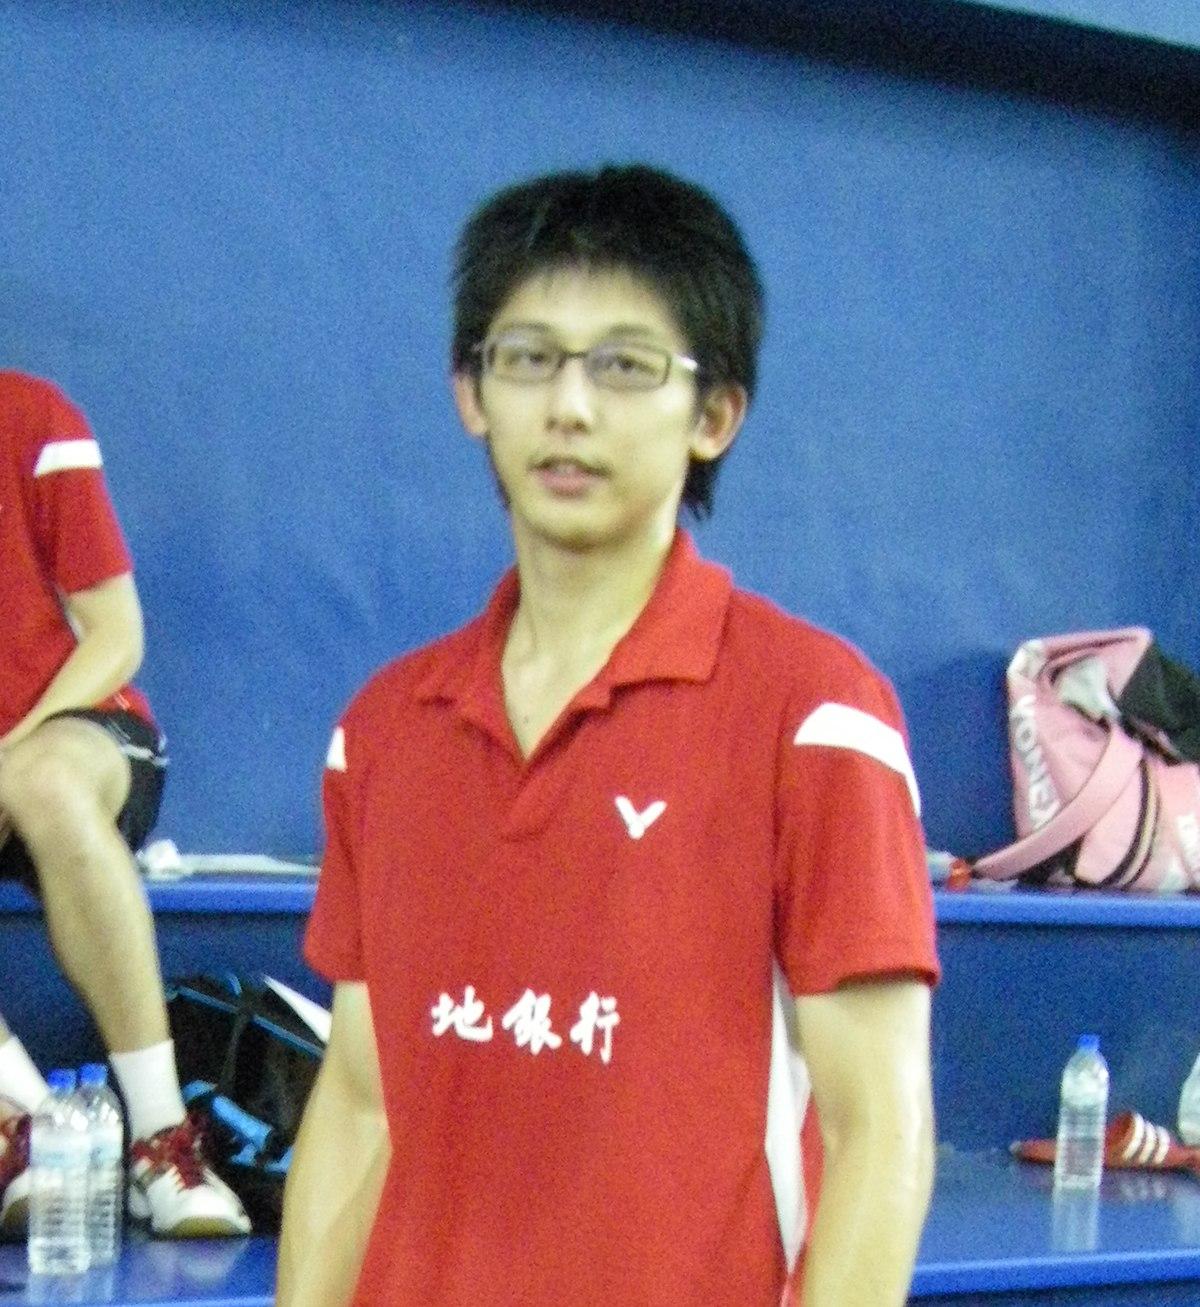 Chen Hung ling